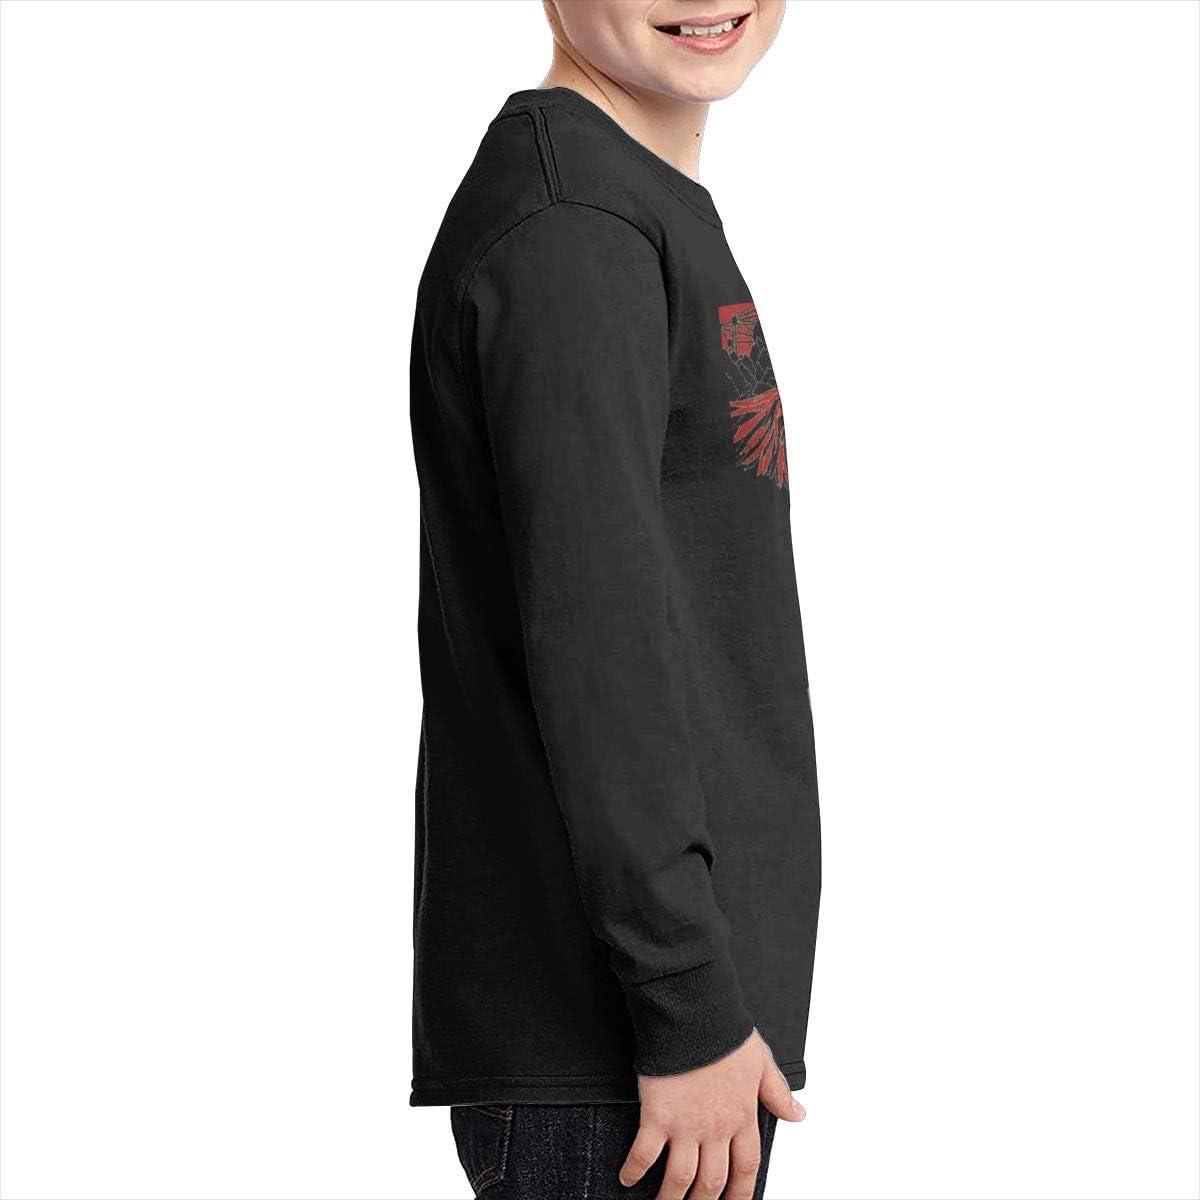 Optumus Chris-Cornell Kids Sweatshirts Long Sleeve T Shirt Boy Girl Children Teenagers Unisex Tee